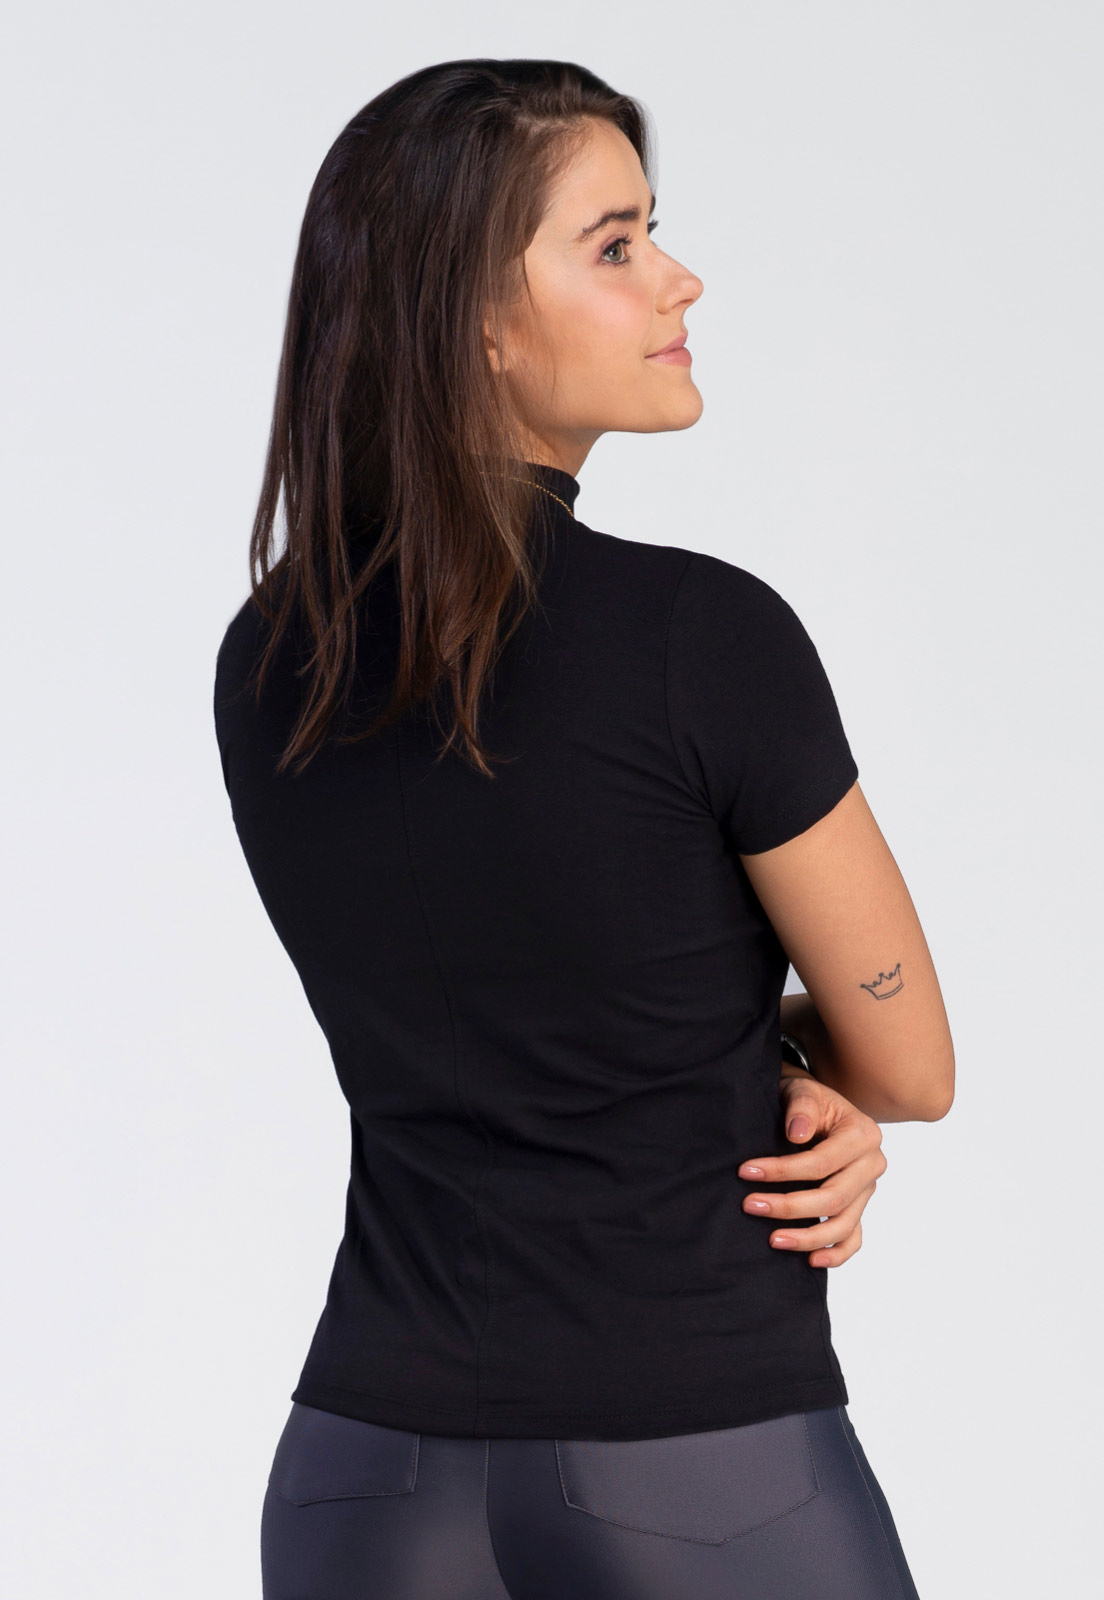 Kit c/ 2 T-shirts Ana - Branca e Preta